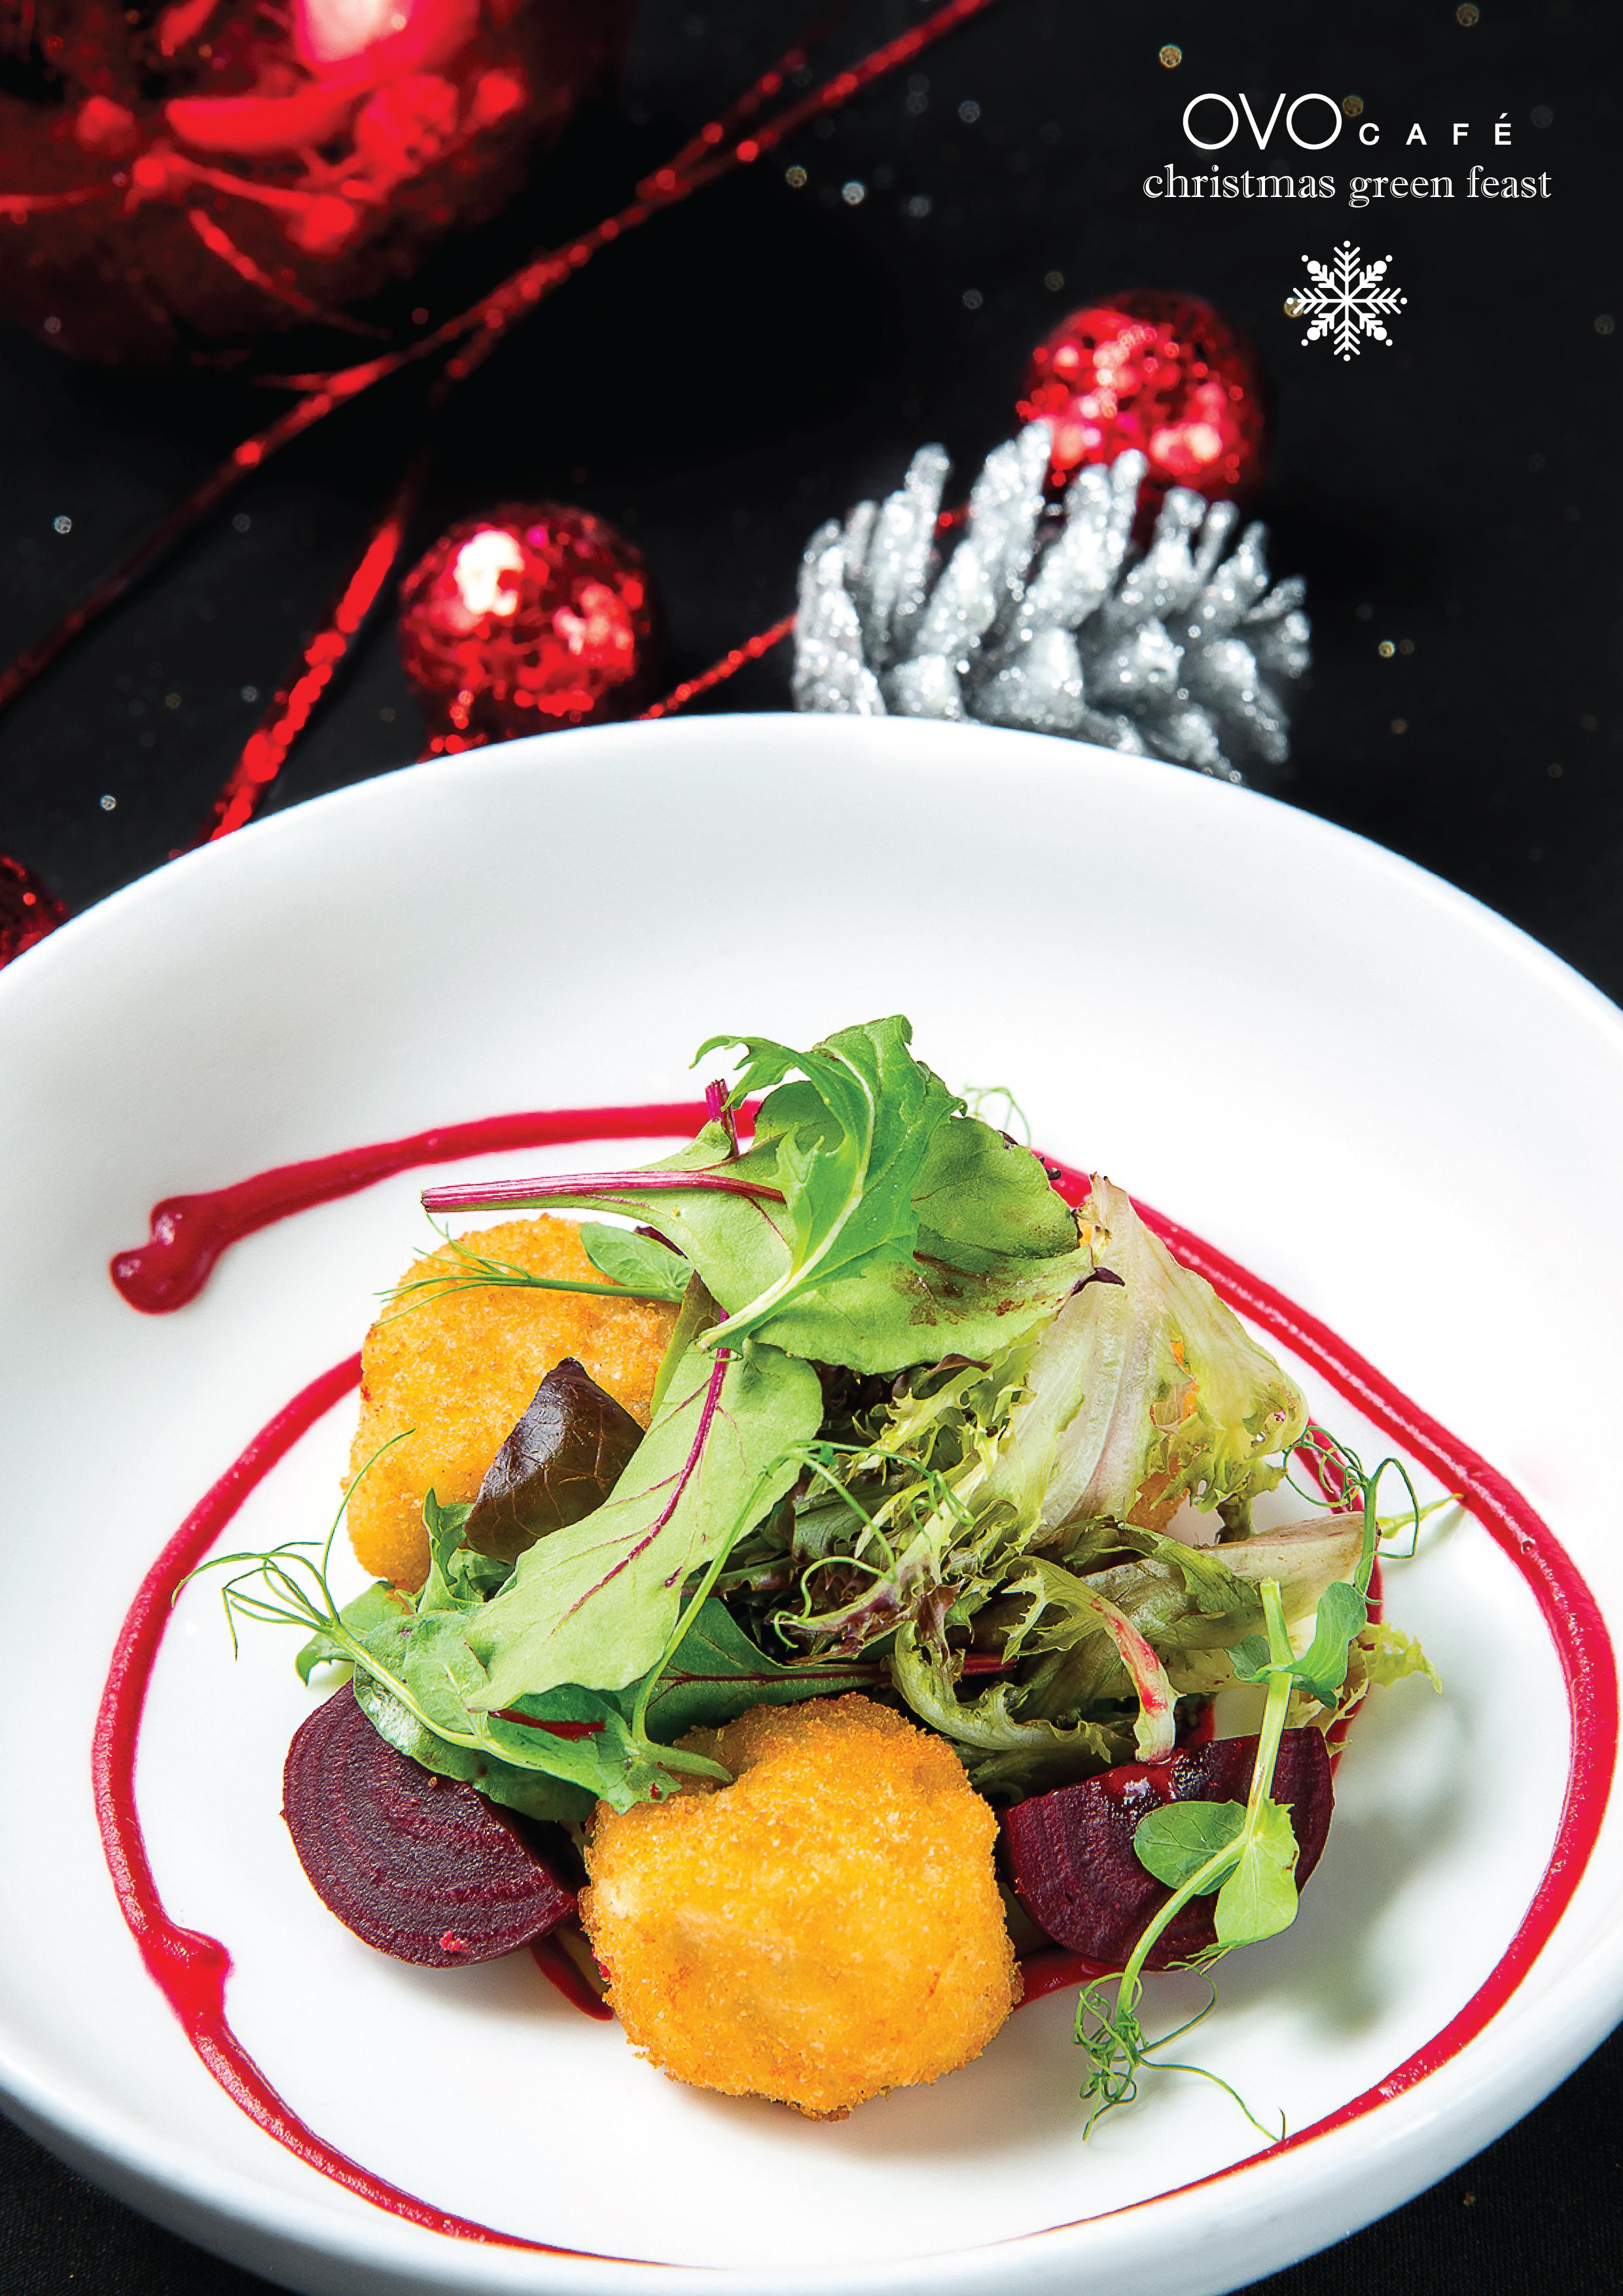 vegan crab cake with beetroot yoghurt salad 紅菜頭乳酪沙津 配素蟹餅